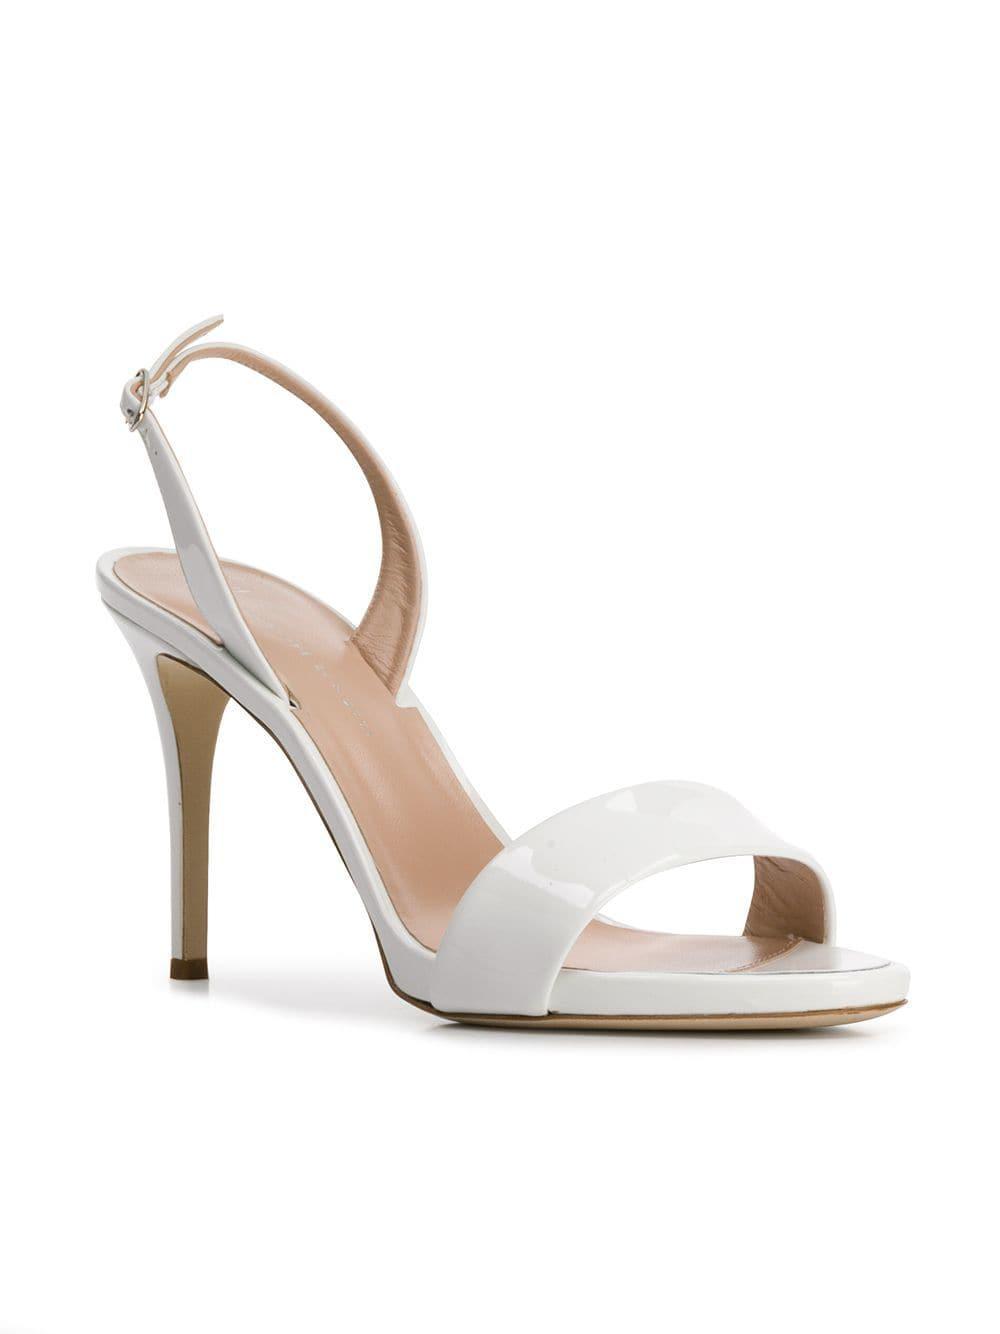 eef7bfd4d916 Giuseppe Zanotti - White Sofia Slingback Sandals - Lyst. View fullscreen